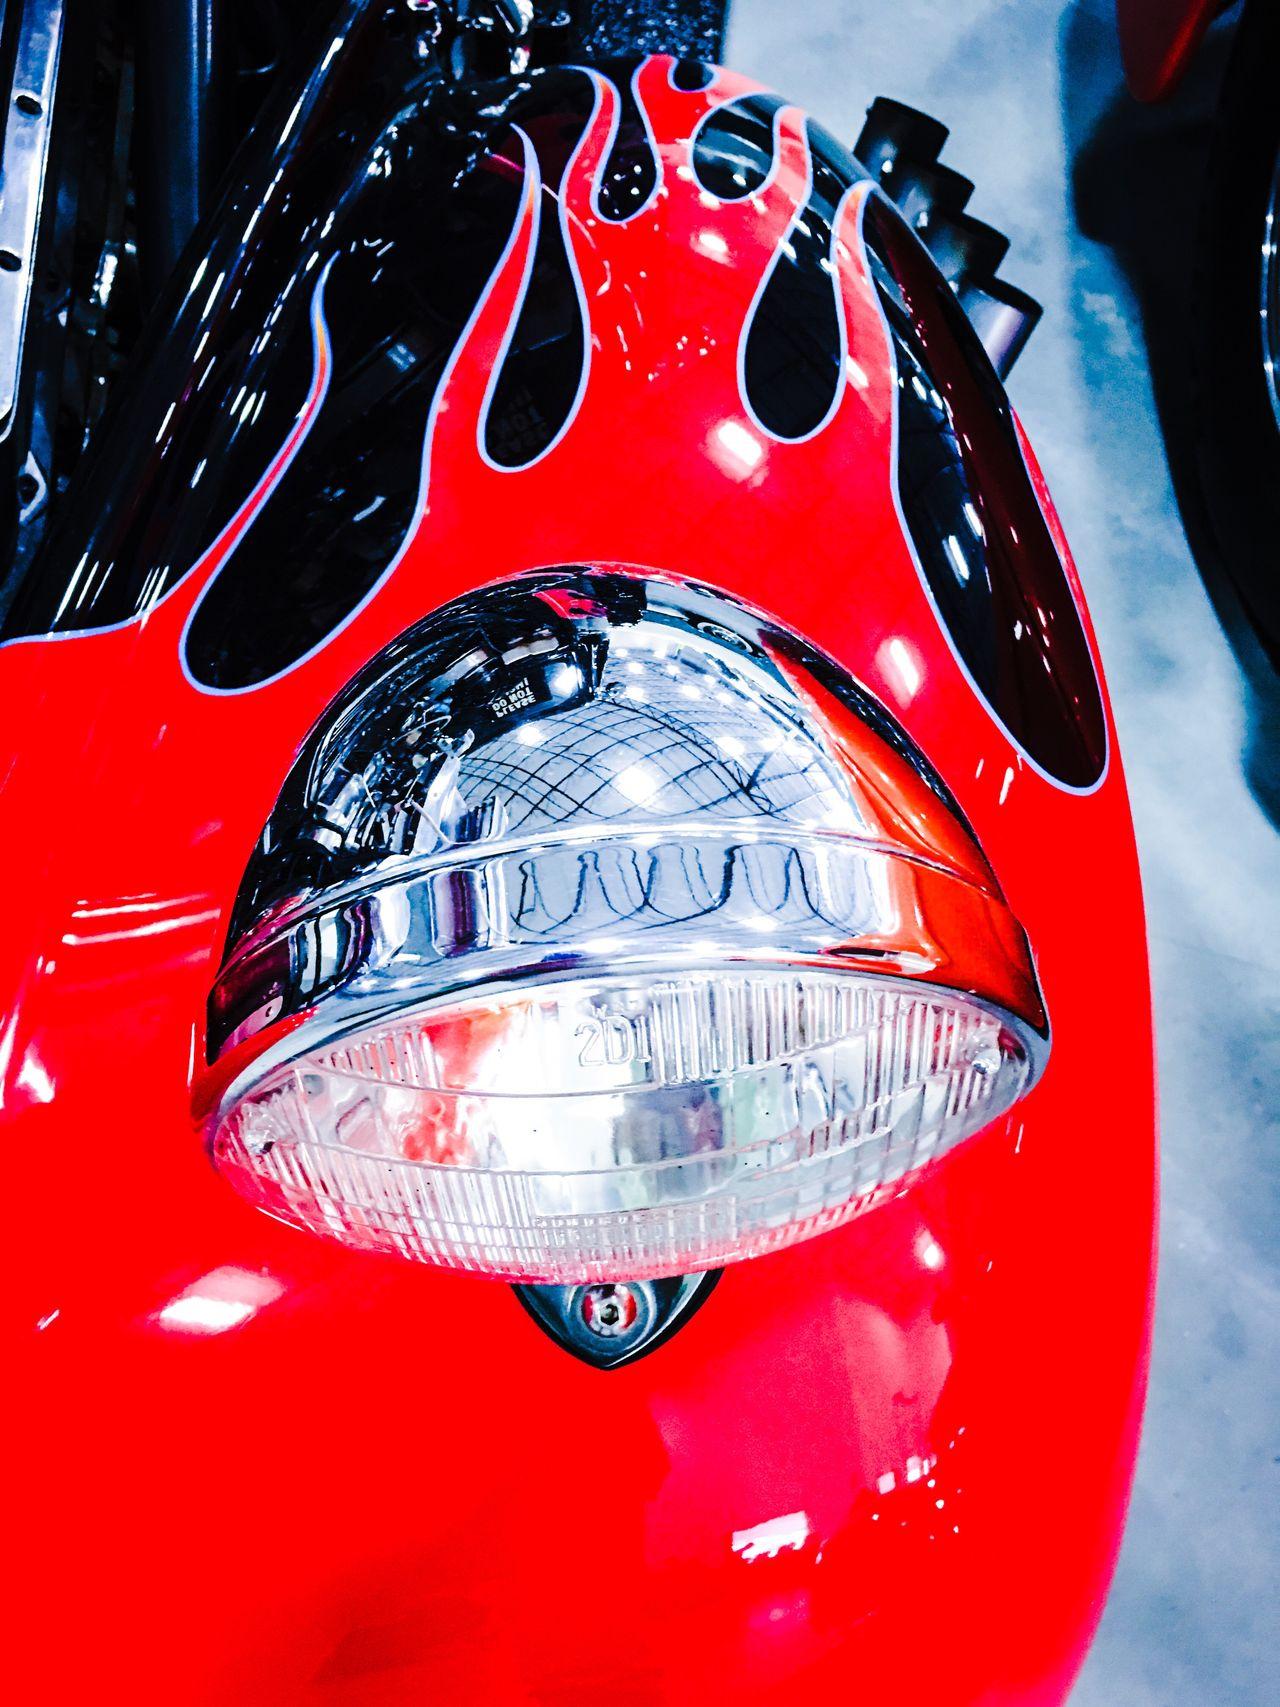 Spotlight Spotlights Headlight Shiny Shine Bright Bright Colors Brightness Bright Red Fender American Cars PaintJob American Cars Vintage Car Love USA Chrome Chromeshooting Vintage Cars Musclecars Car Car Lovers Chrome Series Old Cars MeinAutomoment